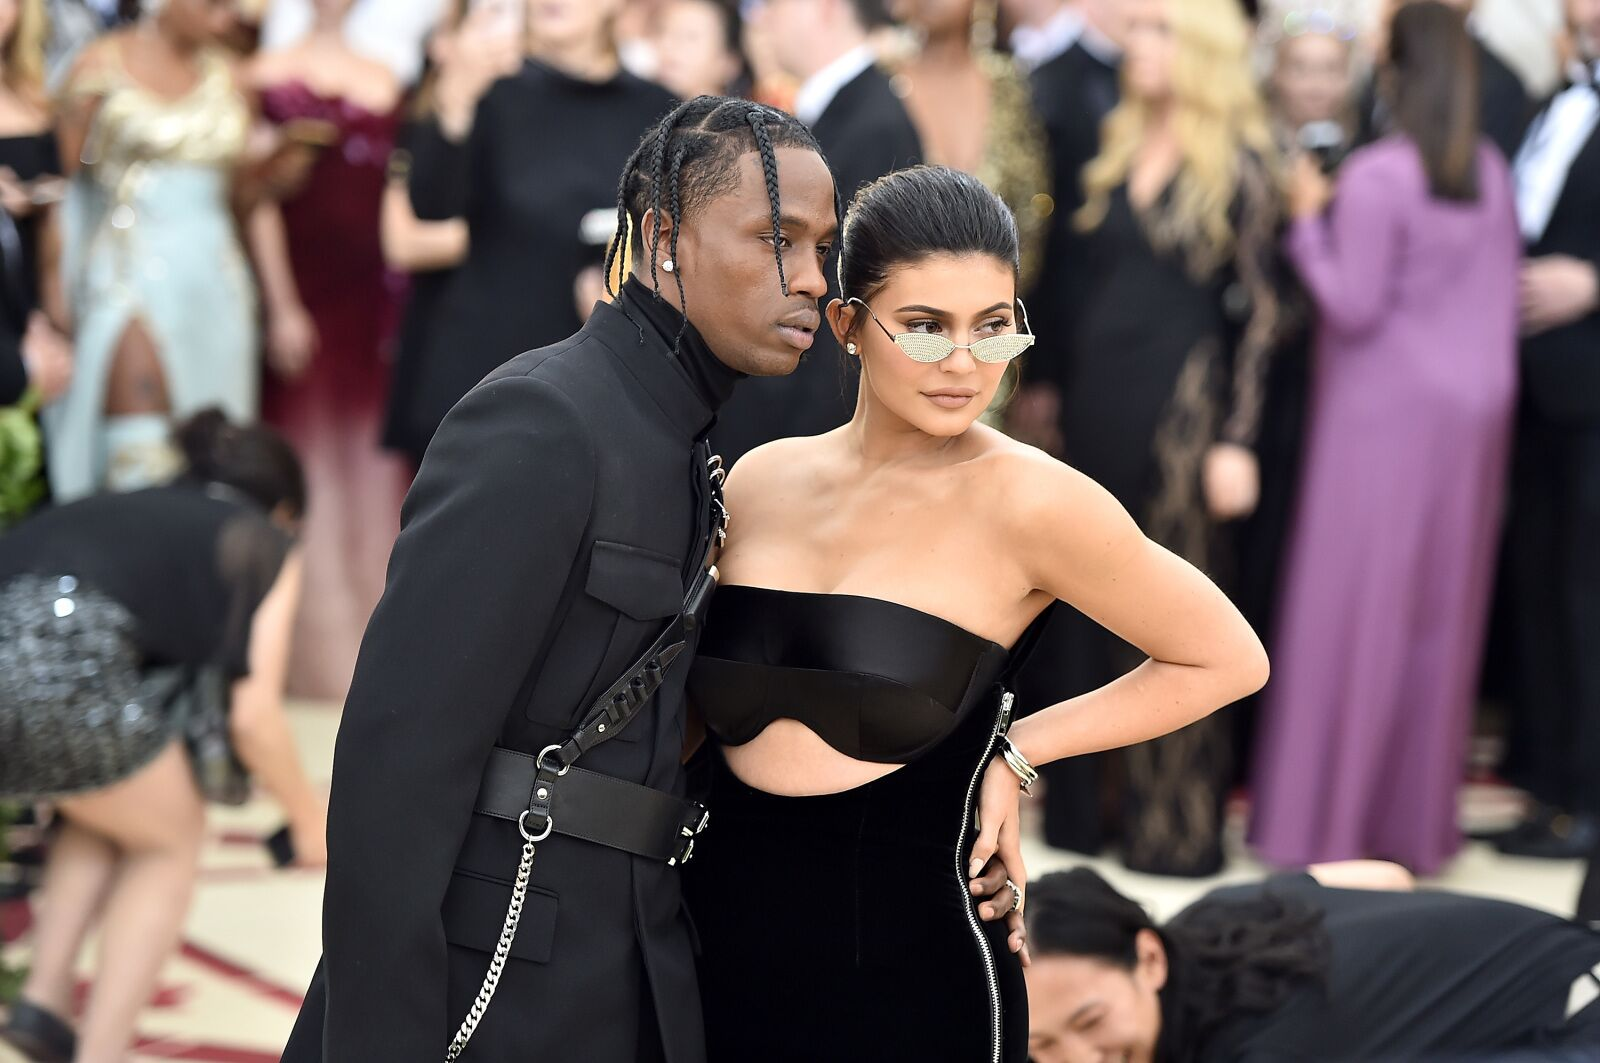 Kylie Jenner bares butt, toned thighs, long legs in leotard on Instagram amid new Travis Scott cheating rumors